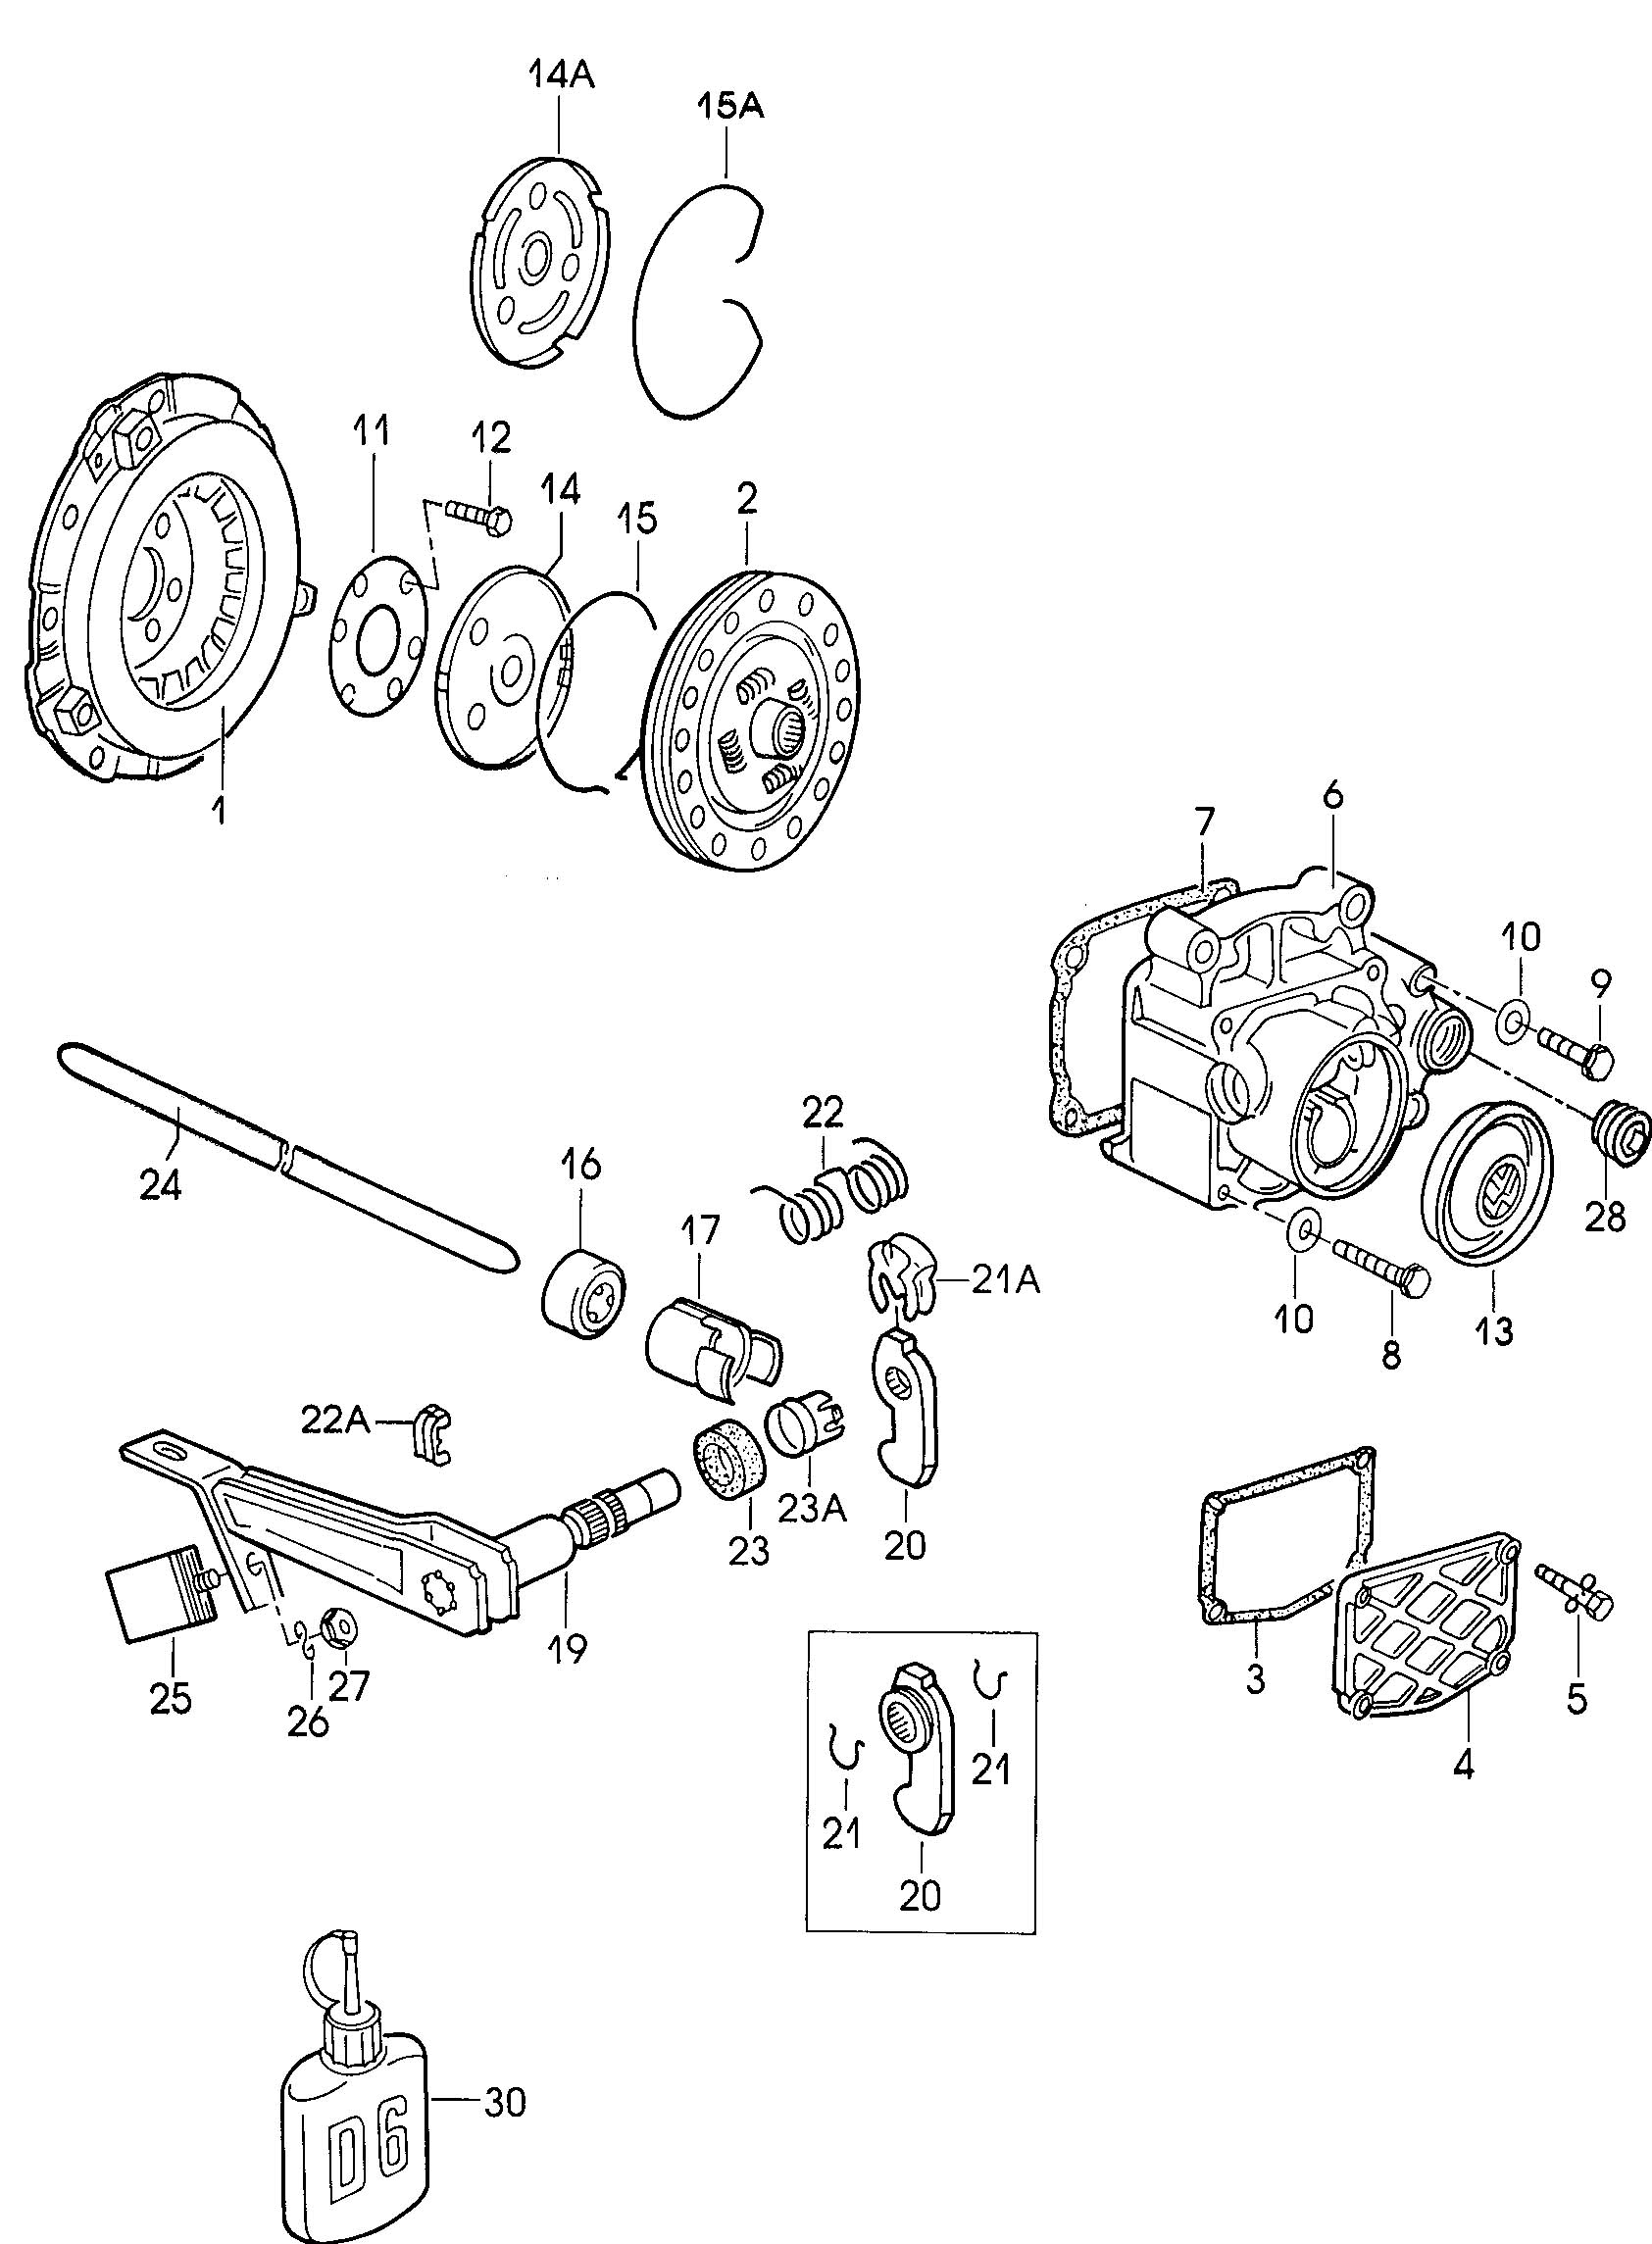 vw eos parts diagram sky q multiroom wiring volkswagen hyundai veloster